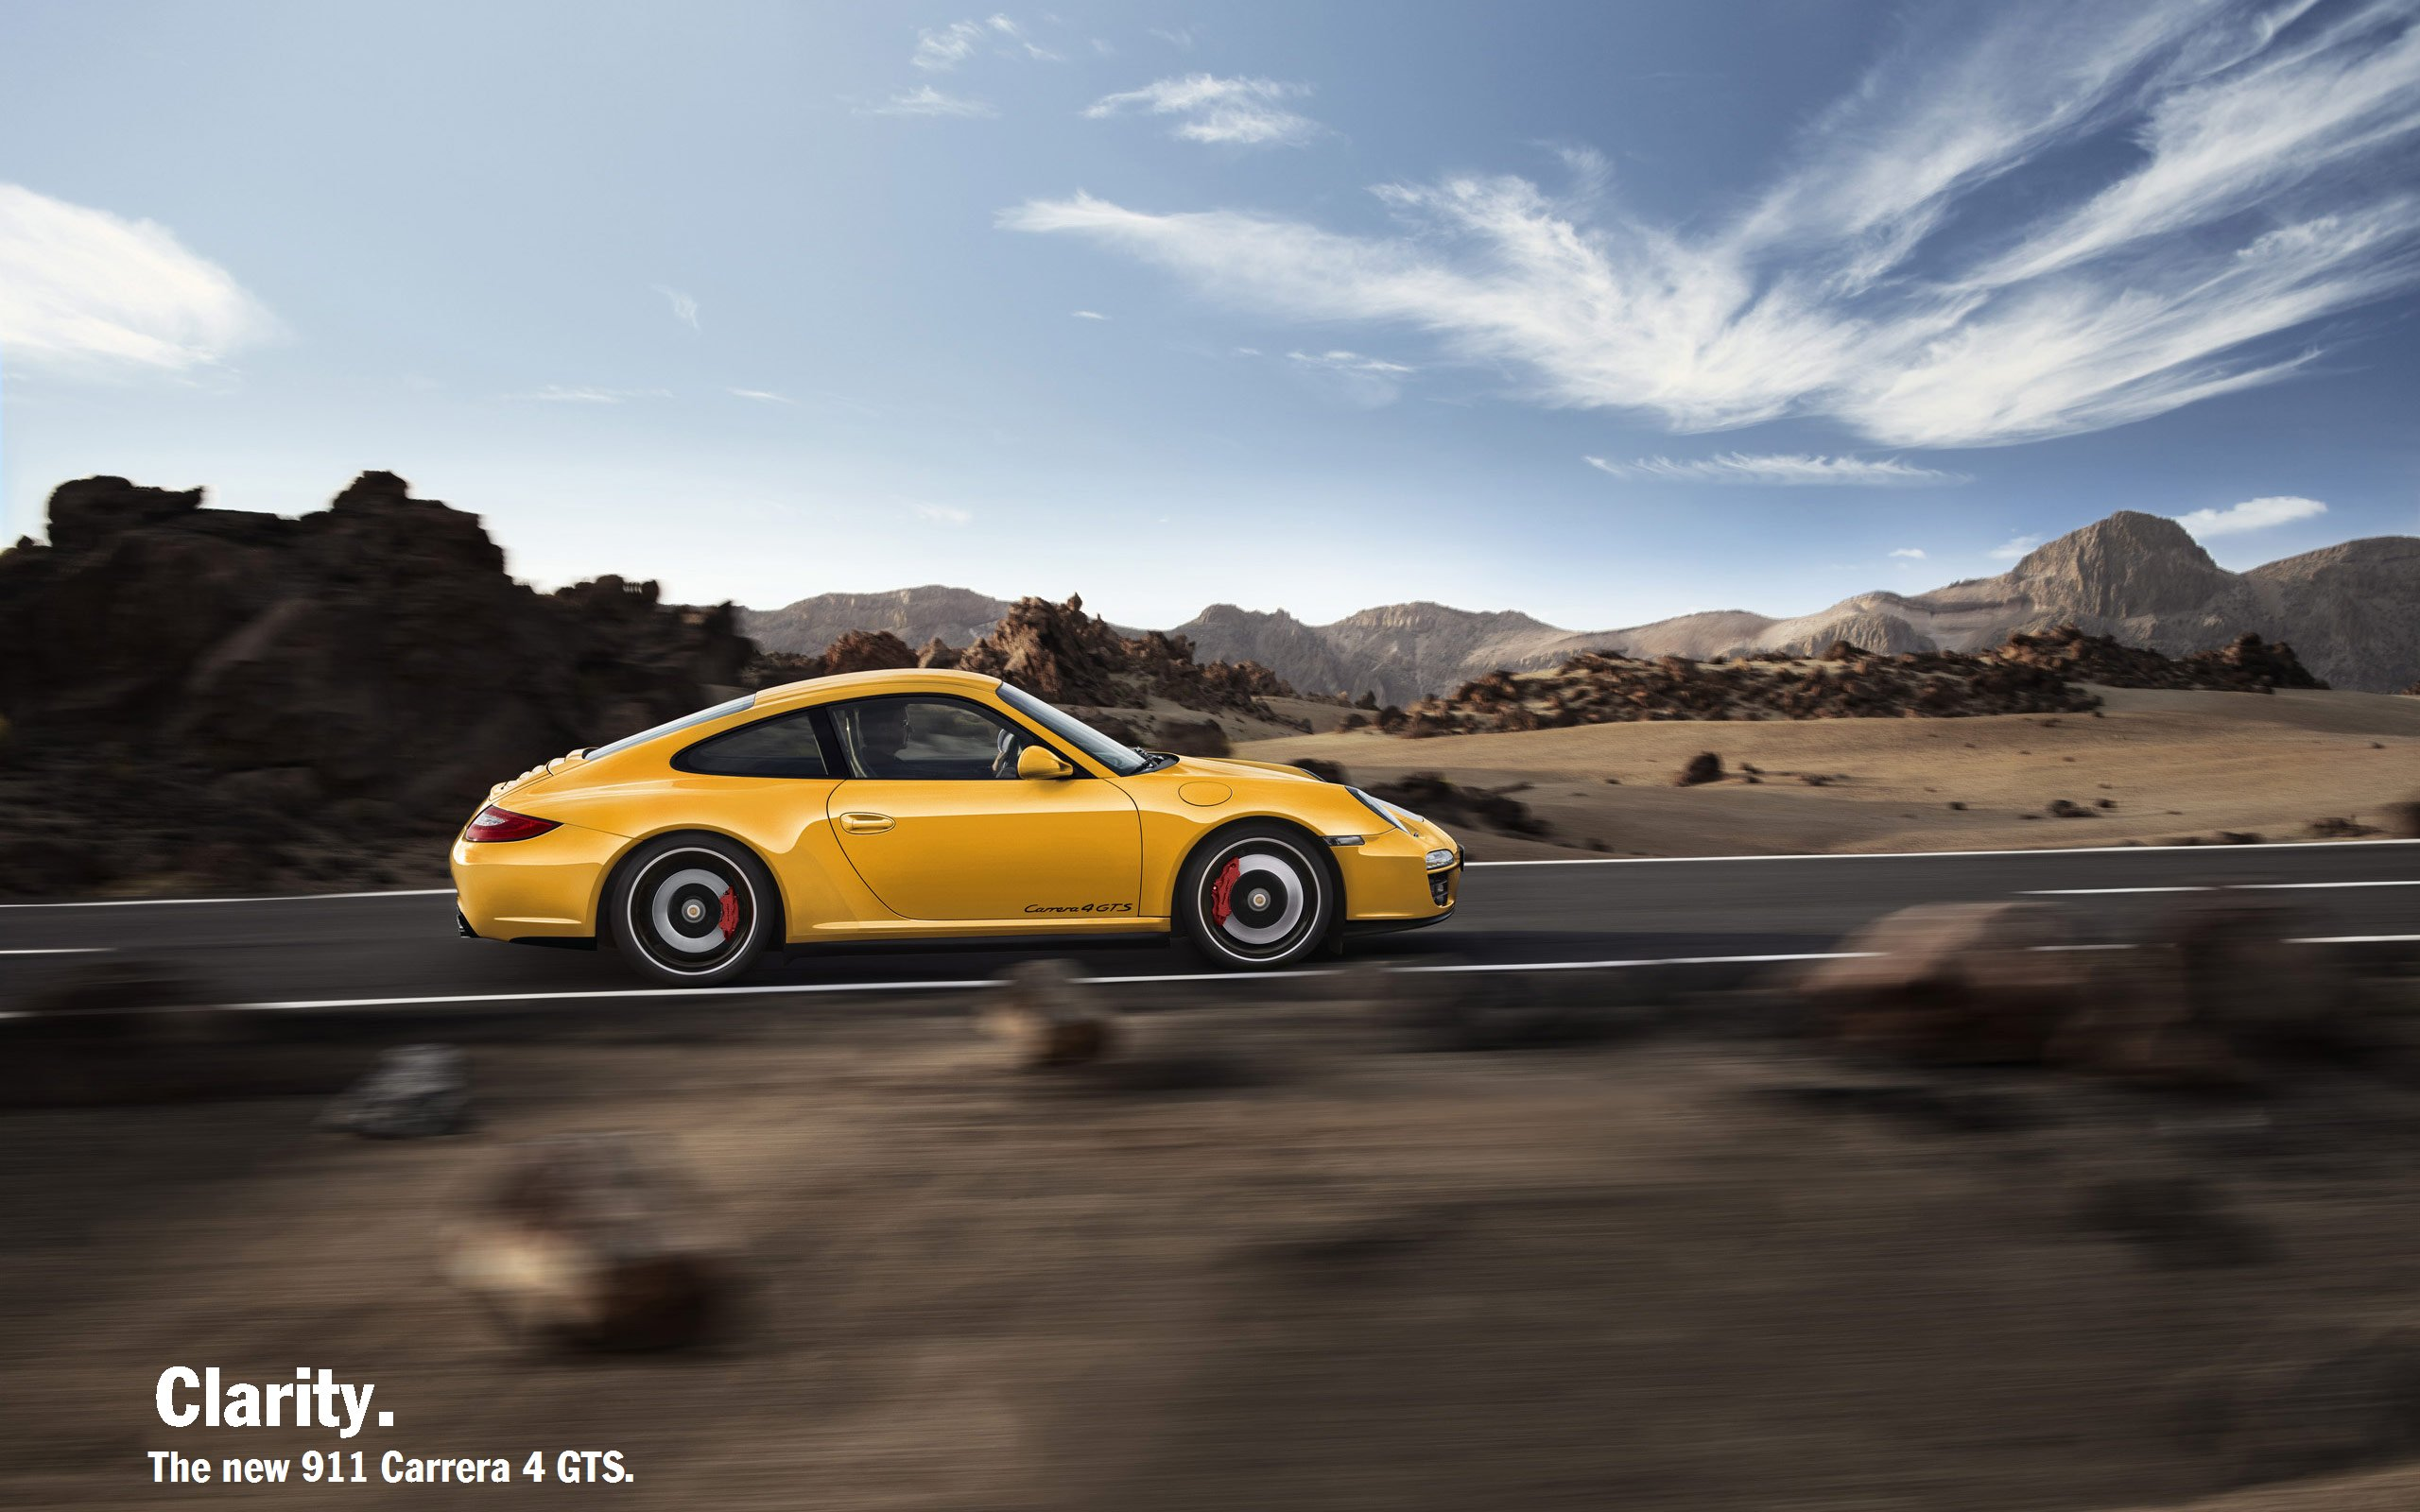 Porsche 911 Carrera GTS Pictures Car HD Wallpapers 2560x1600